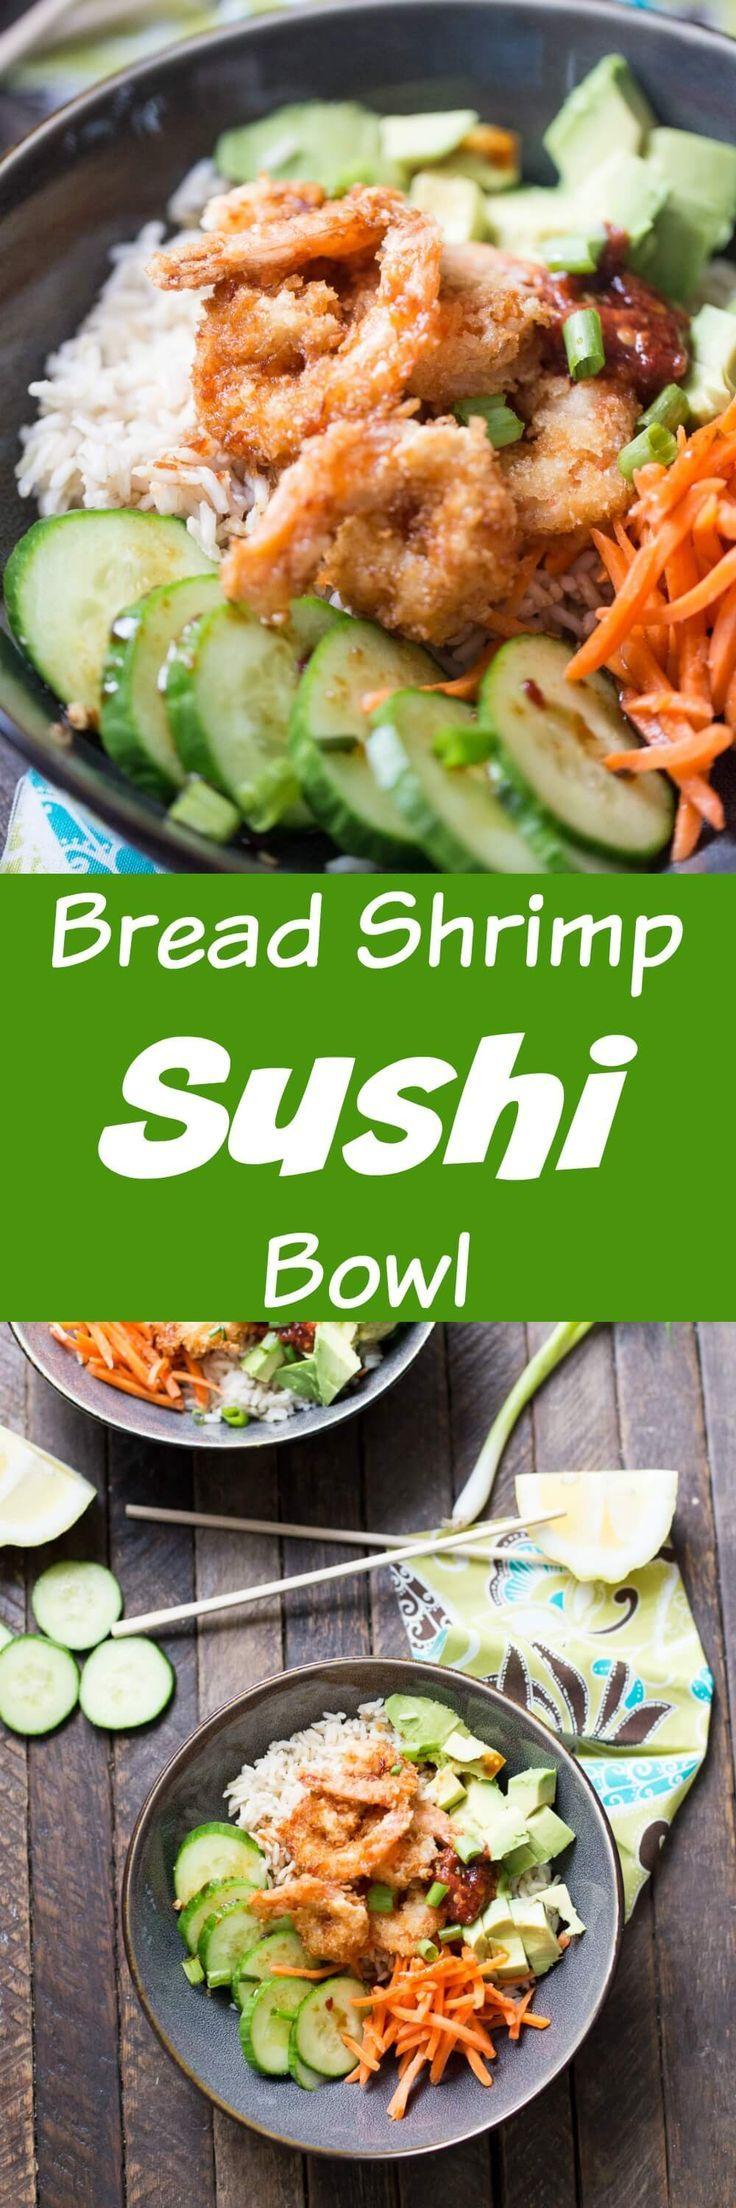 Baked Garlic Shrimp   Recipe (With images)   Shrimp ...   Breaded Shrimp Dinner Ideas